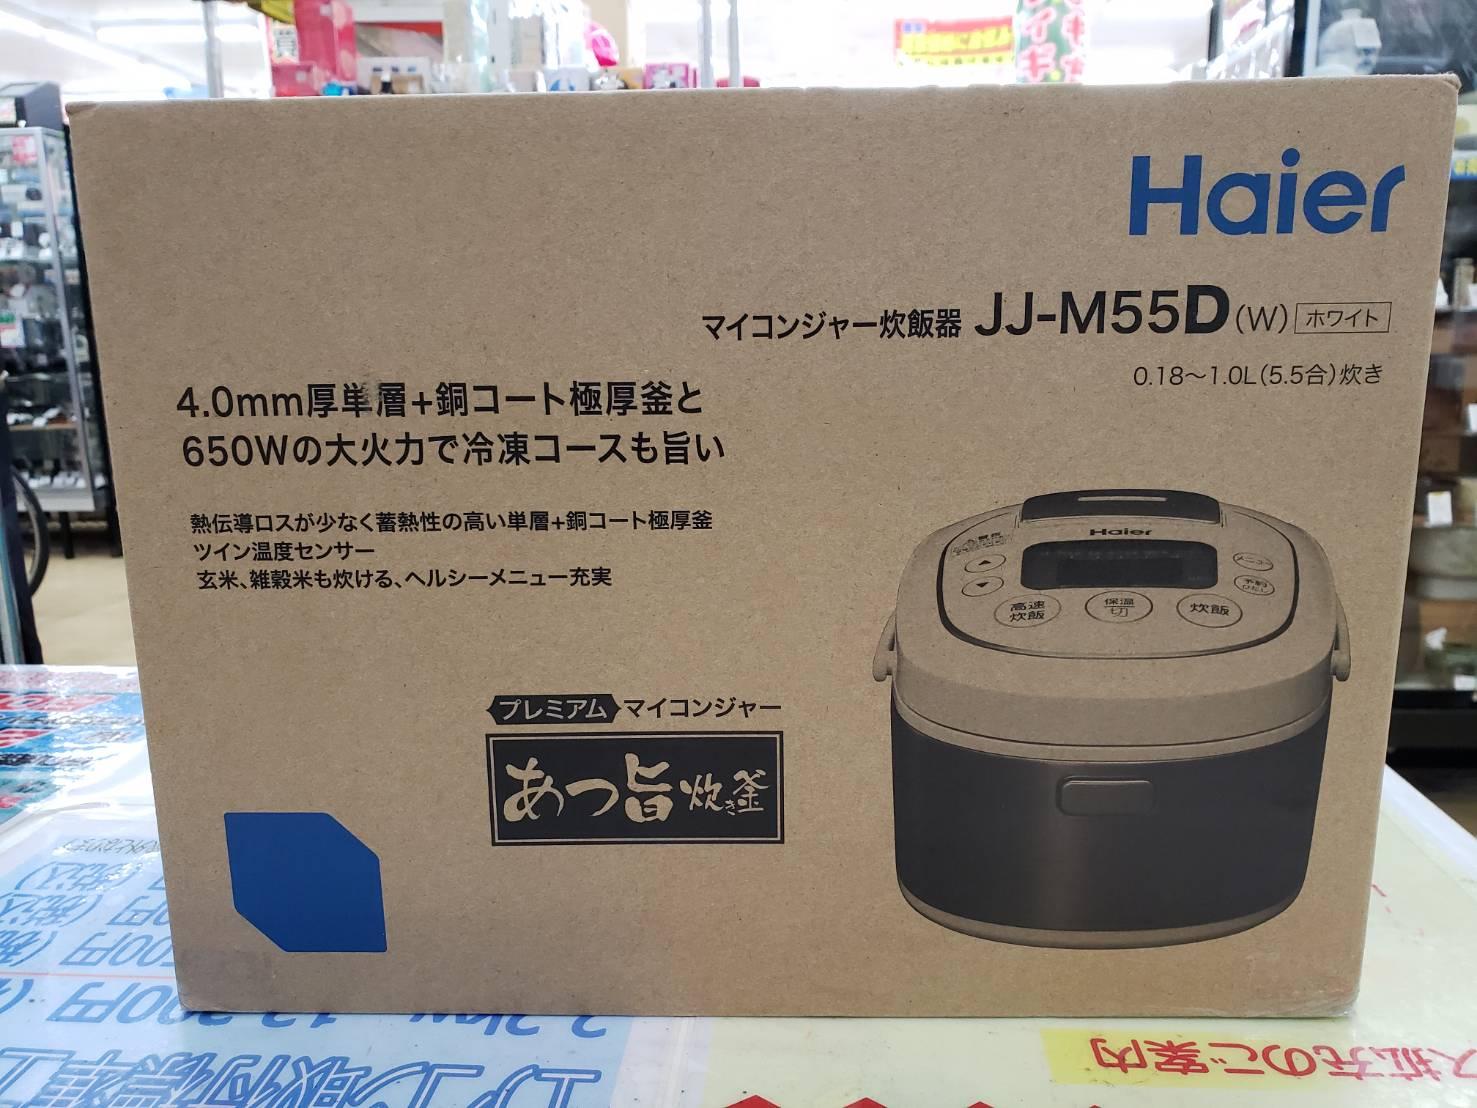 Haier / ハイアール 5.5合 炊飯ジャー JJ-M55D 未使用品 買取致しました!の買取-